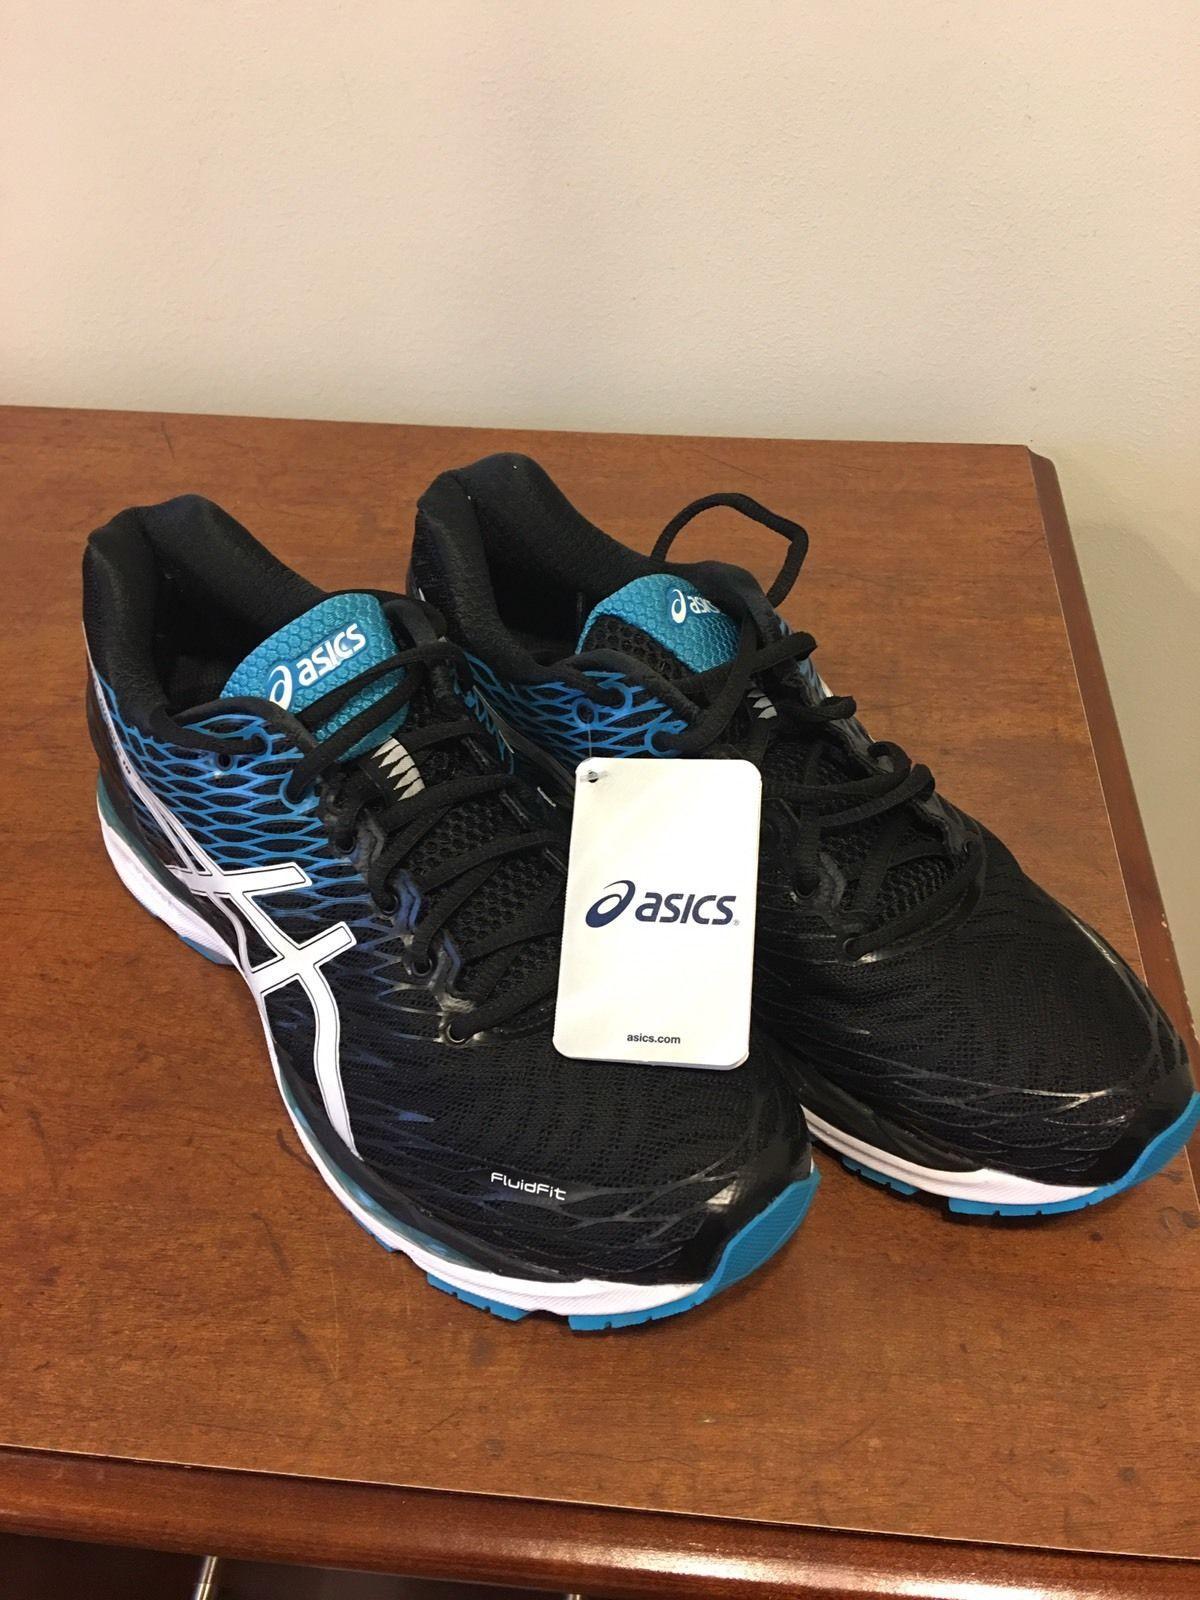 Chaussures de course homme homme taille | 10 Asics Gel Chaussures Nimbus 18 T600N | 1d62722 - reveng-moneysite-pipe-block5.website